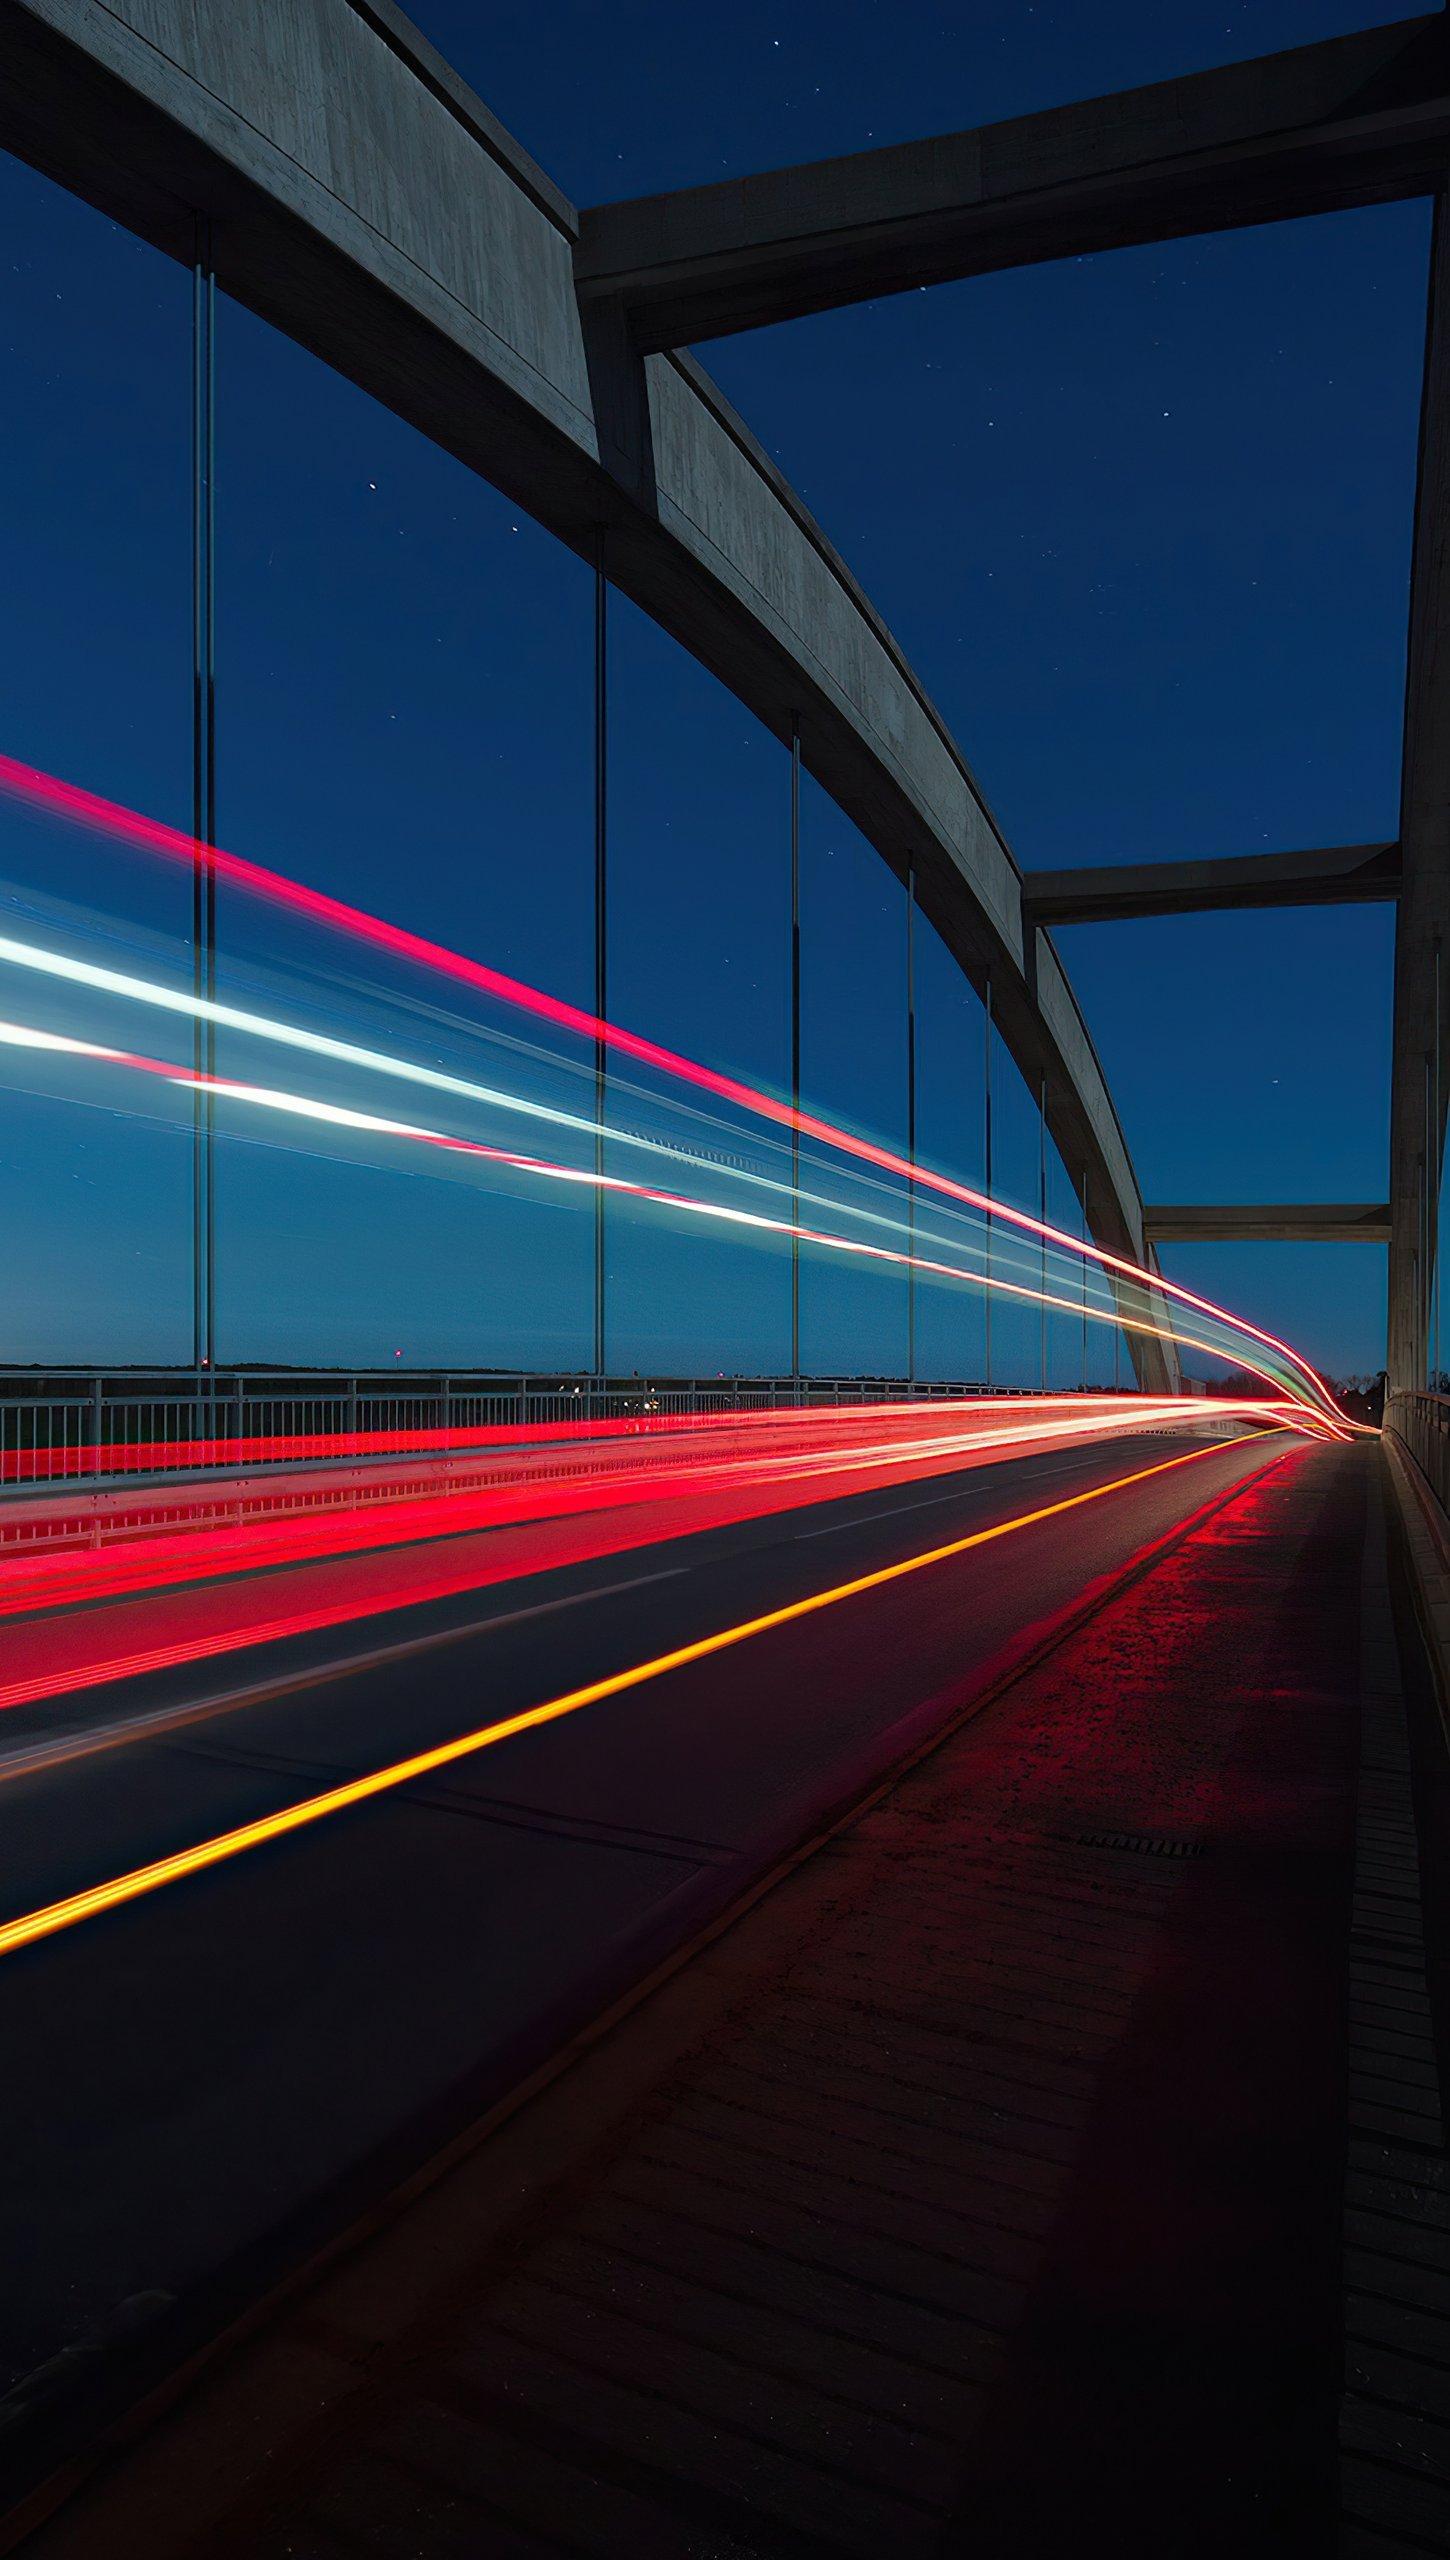 Wallpaper Highway Road Long Exposure Vertical